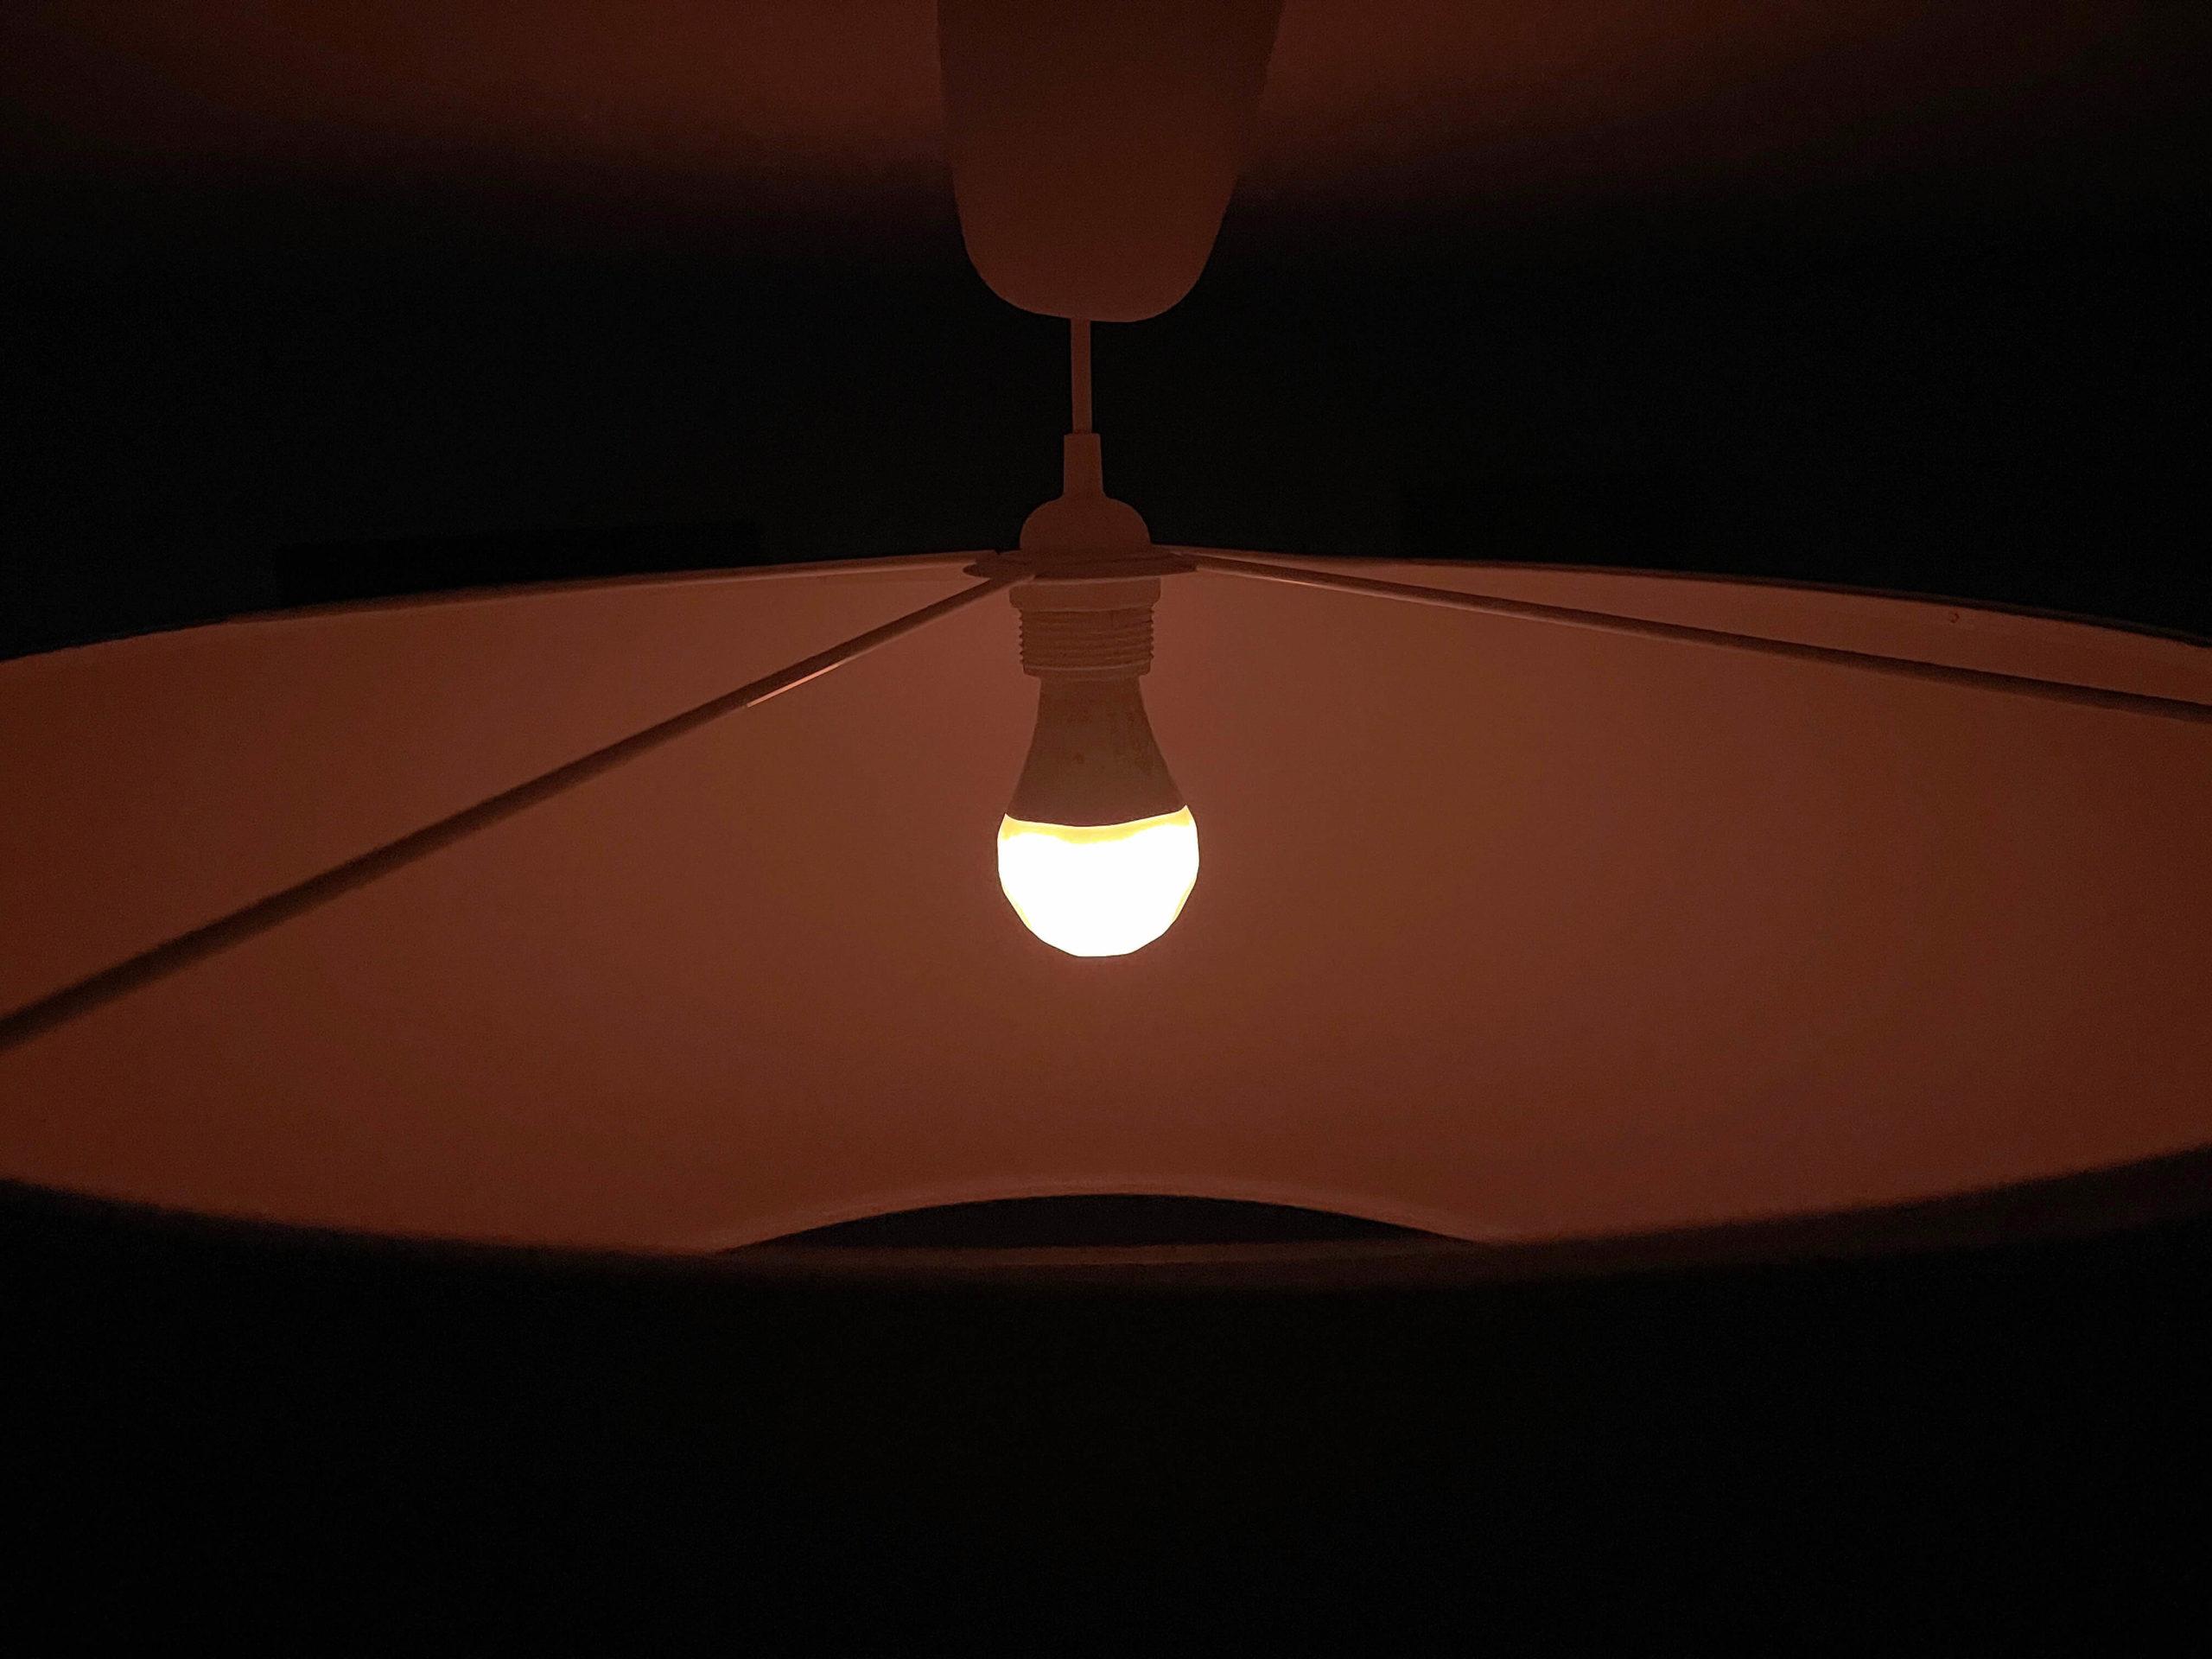 Essentials-E27-LED-Birne-von-Nanoleaf-Apple-HomeKit-Licht-via-Thread1-scaled Essentials E27 LED-Birne von Nanoleaf -  Apple HomeKit-Licht via Thread